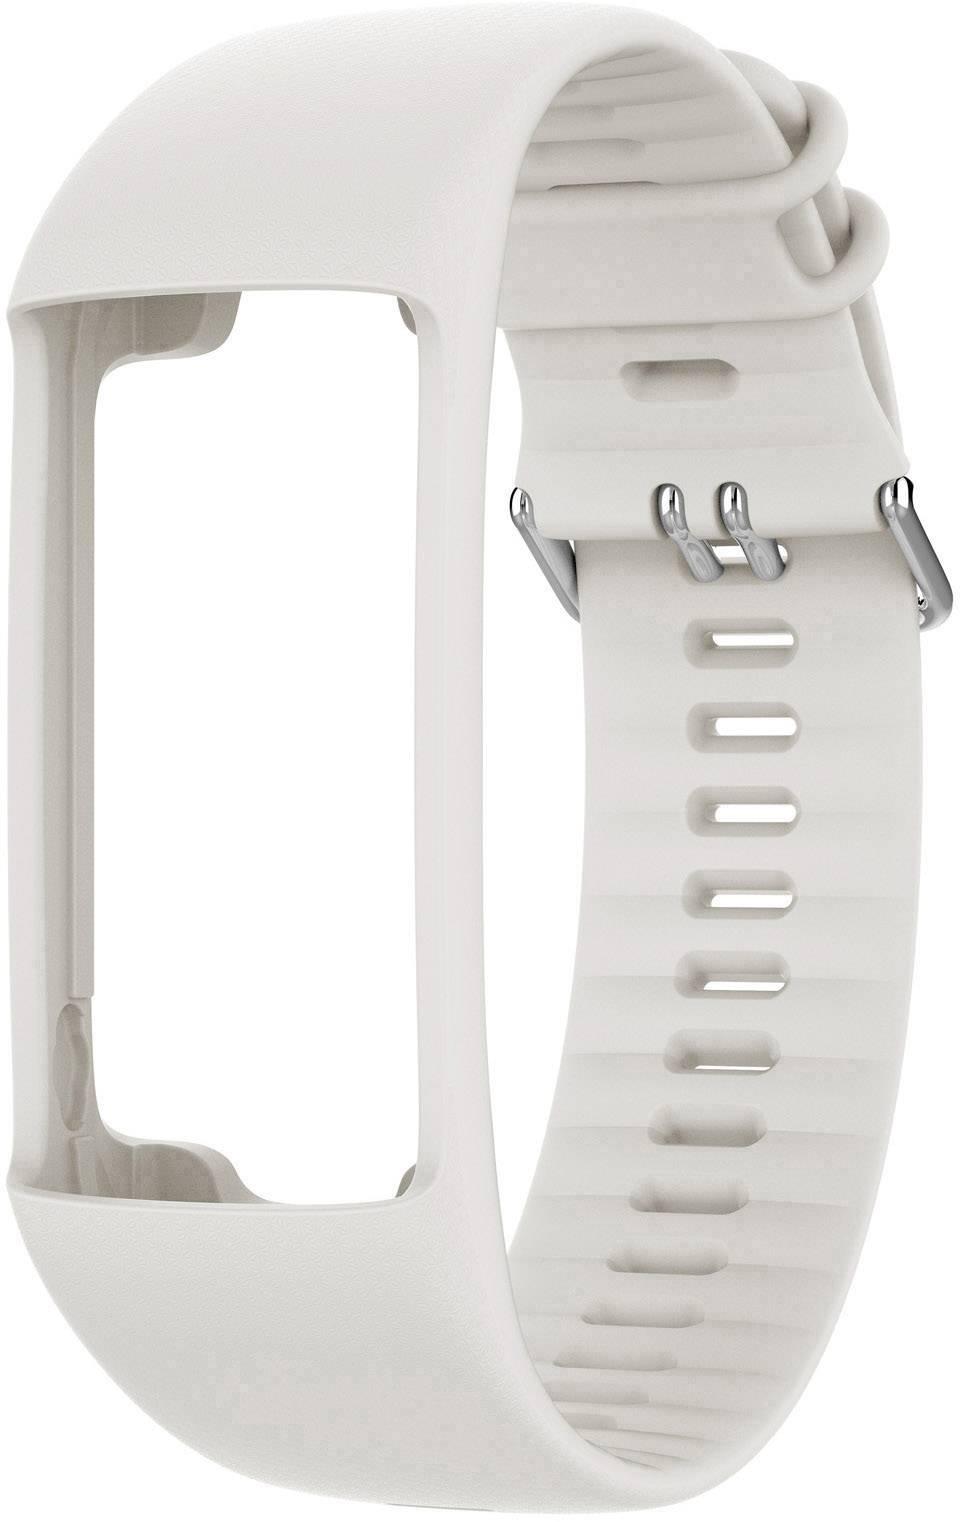 Polar A370 Wrist Band